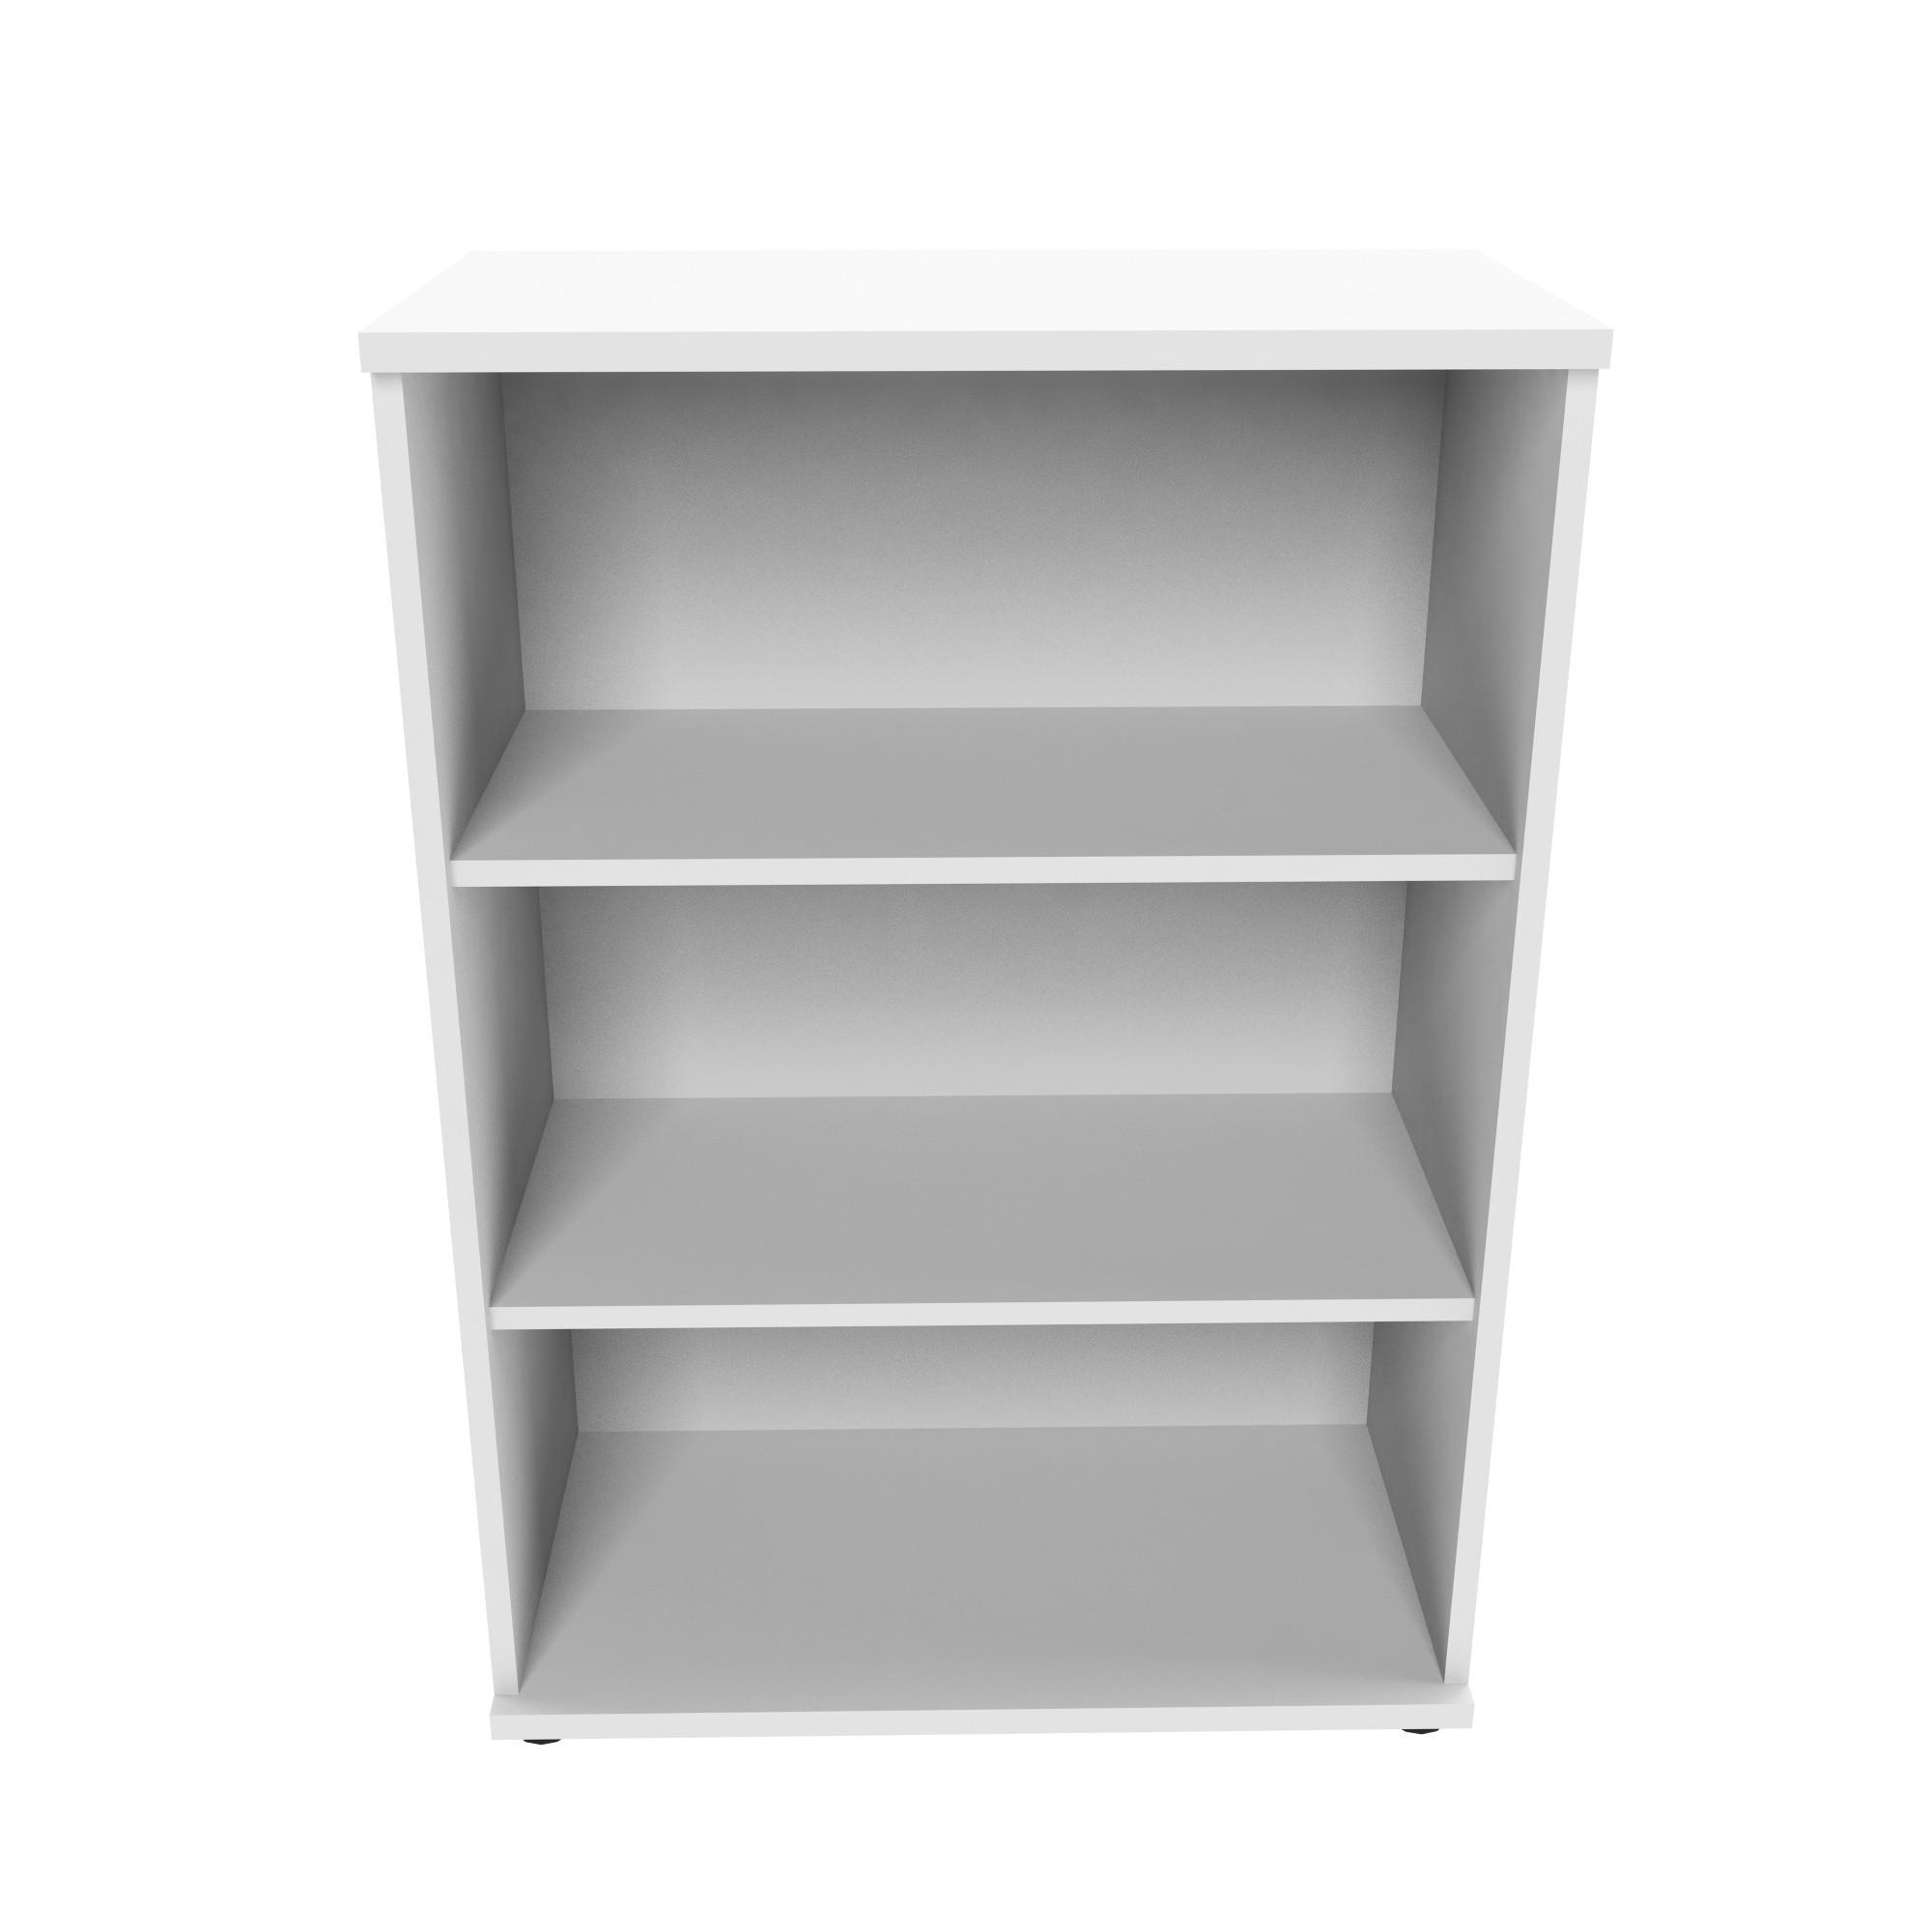 PROFI Bücherragel 3OH Regal Standregal Holzregal Wandregal Schrank Büro Weiß